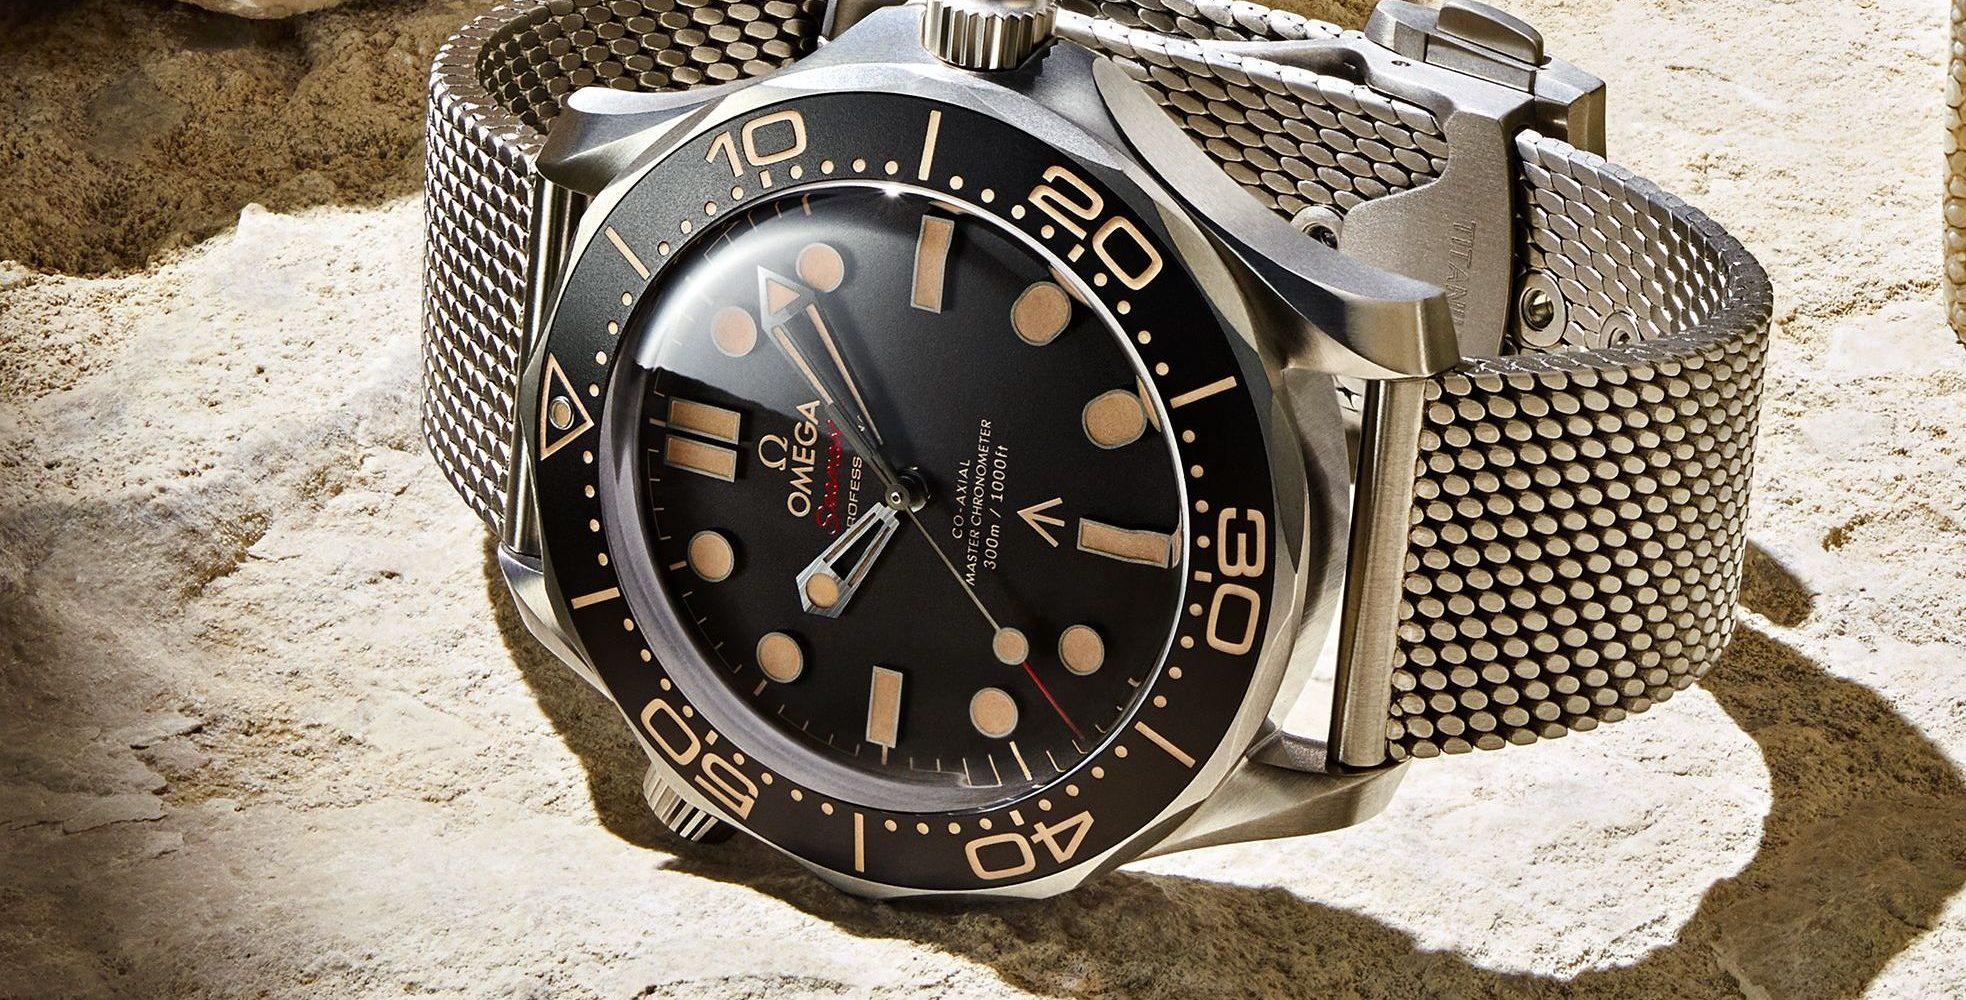 Omega Seamaster 300m in James Bond 007